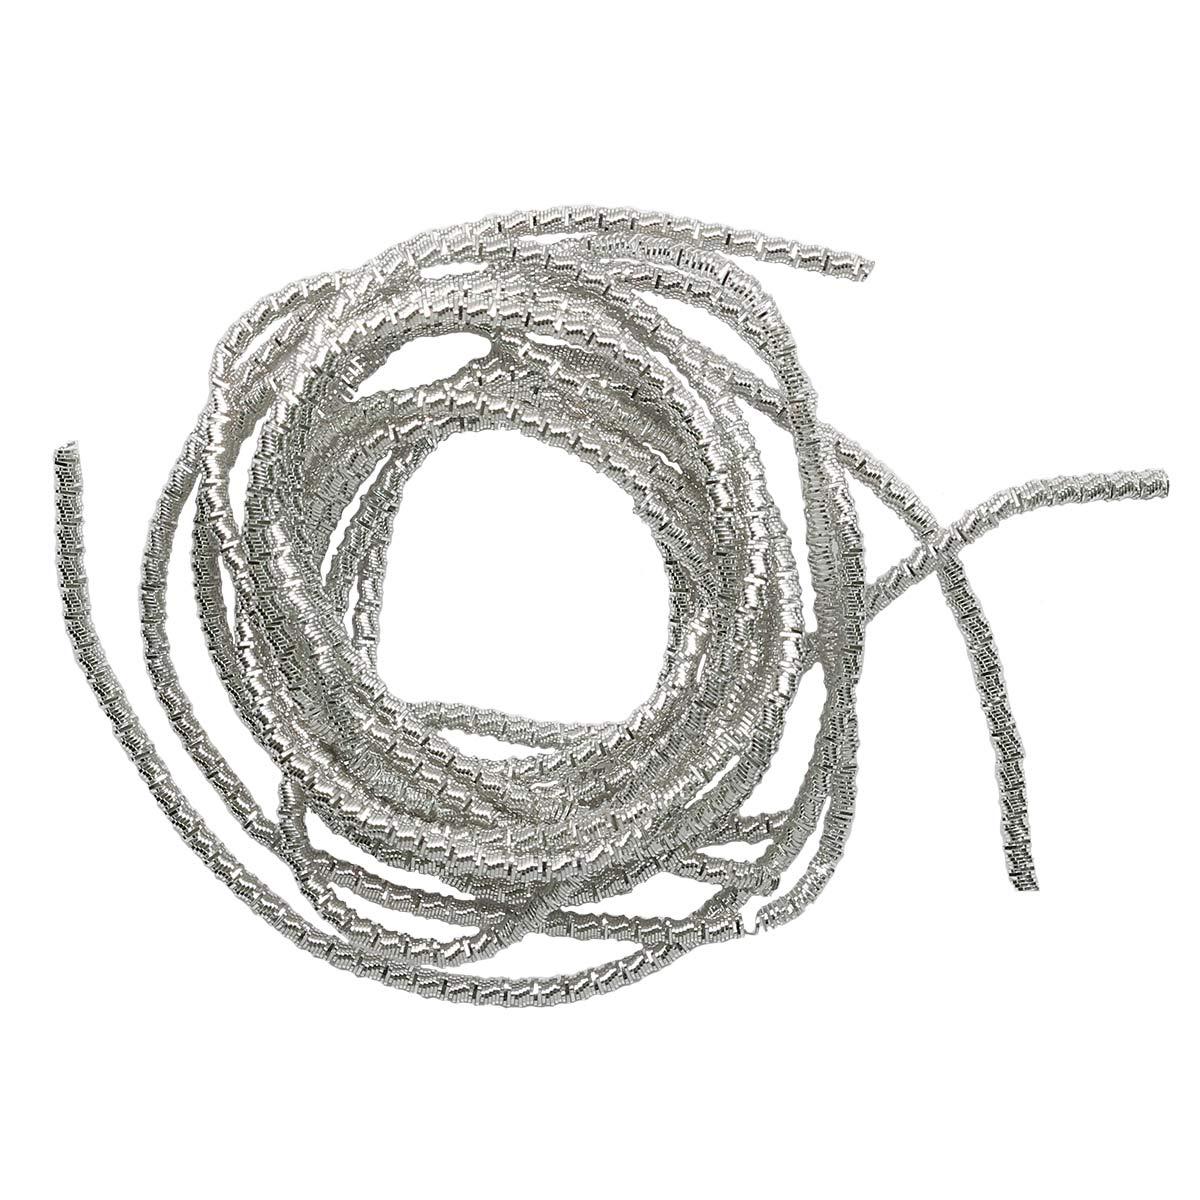 ТБ001НН2 Трунцал витой,серебро 2,0 мм, 5 гр/упак Астра